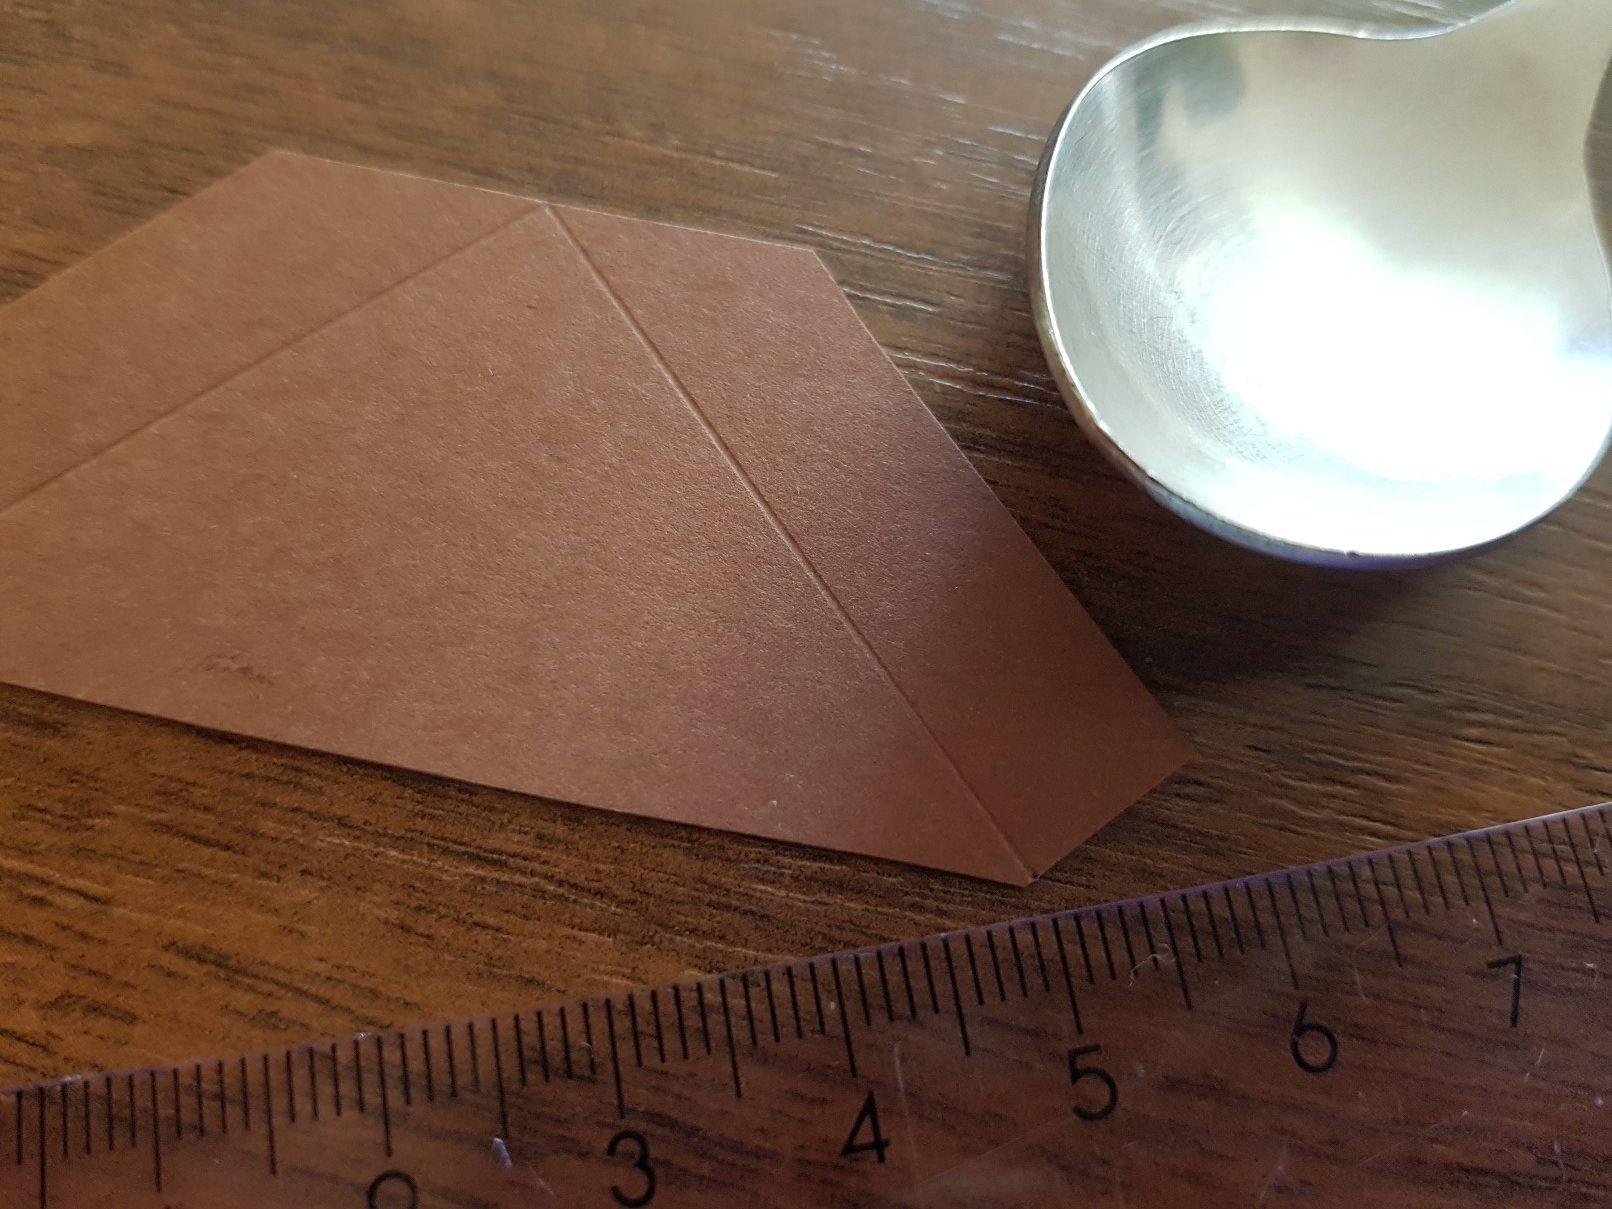 great book of gummi birthday invitation spoon creasing